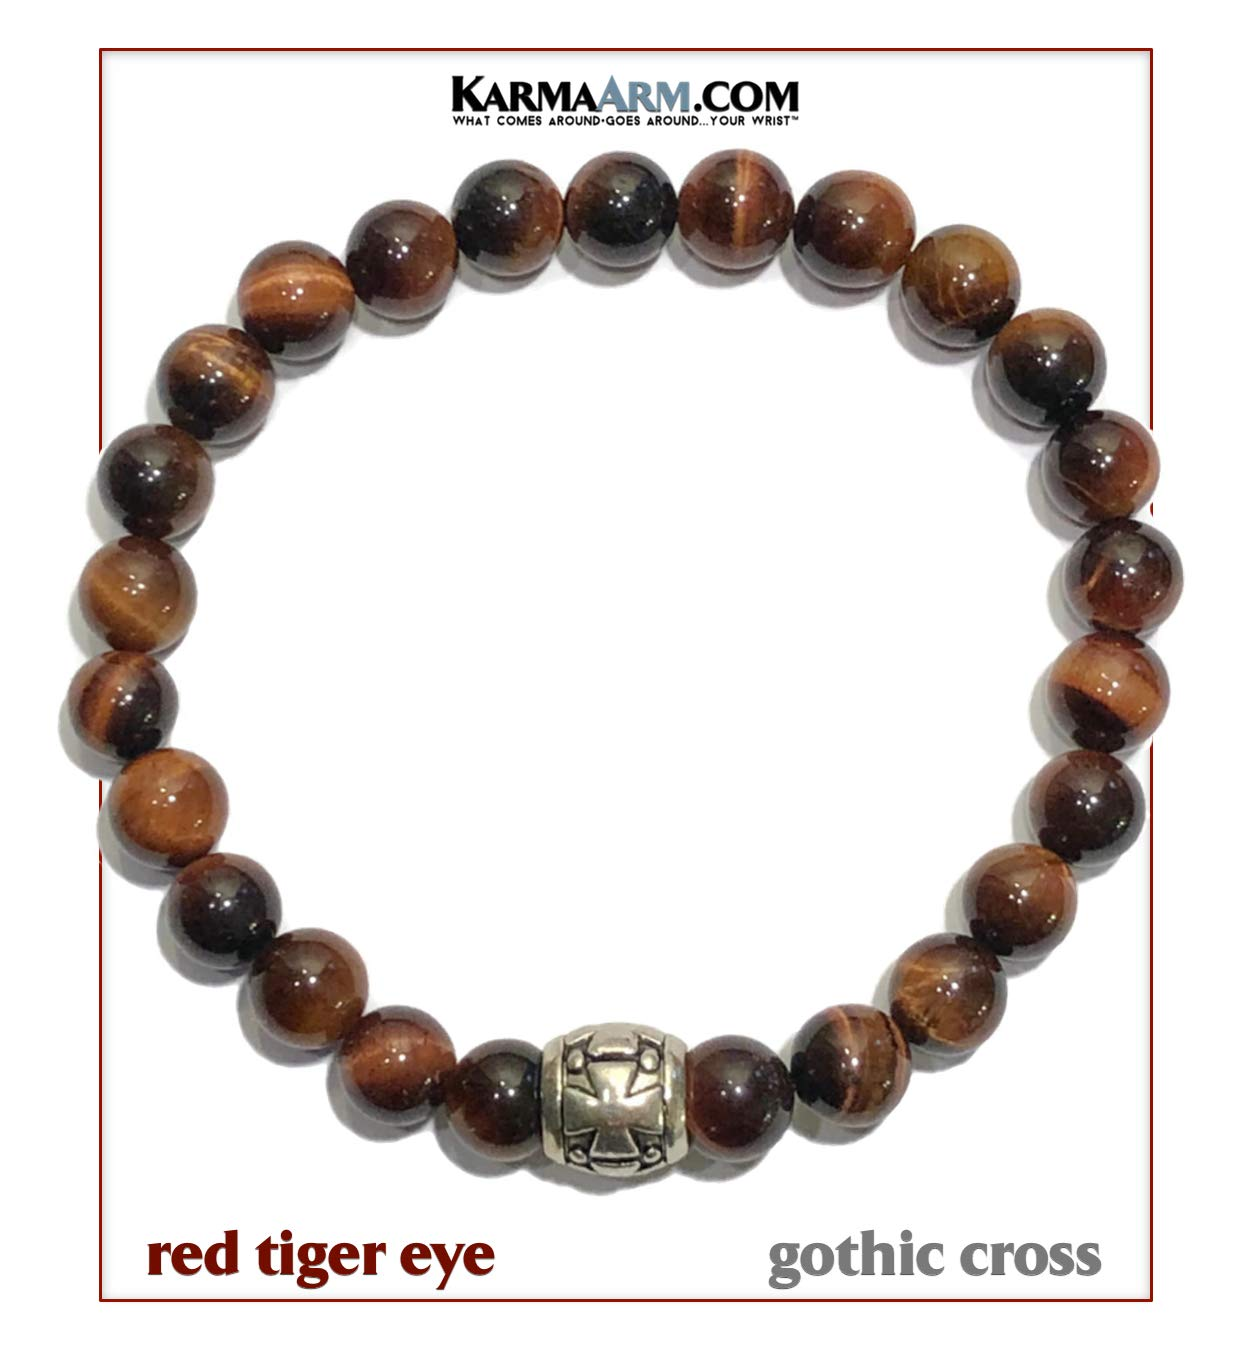 KarmaArm Trust | Red Tiger Eye Cross Bracelet | Mantra Meditation Prayer Wristband | Reiki Healing Energy Bead Zen Self-Care Yoga Jewelry (7.5)